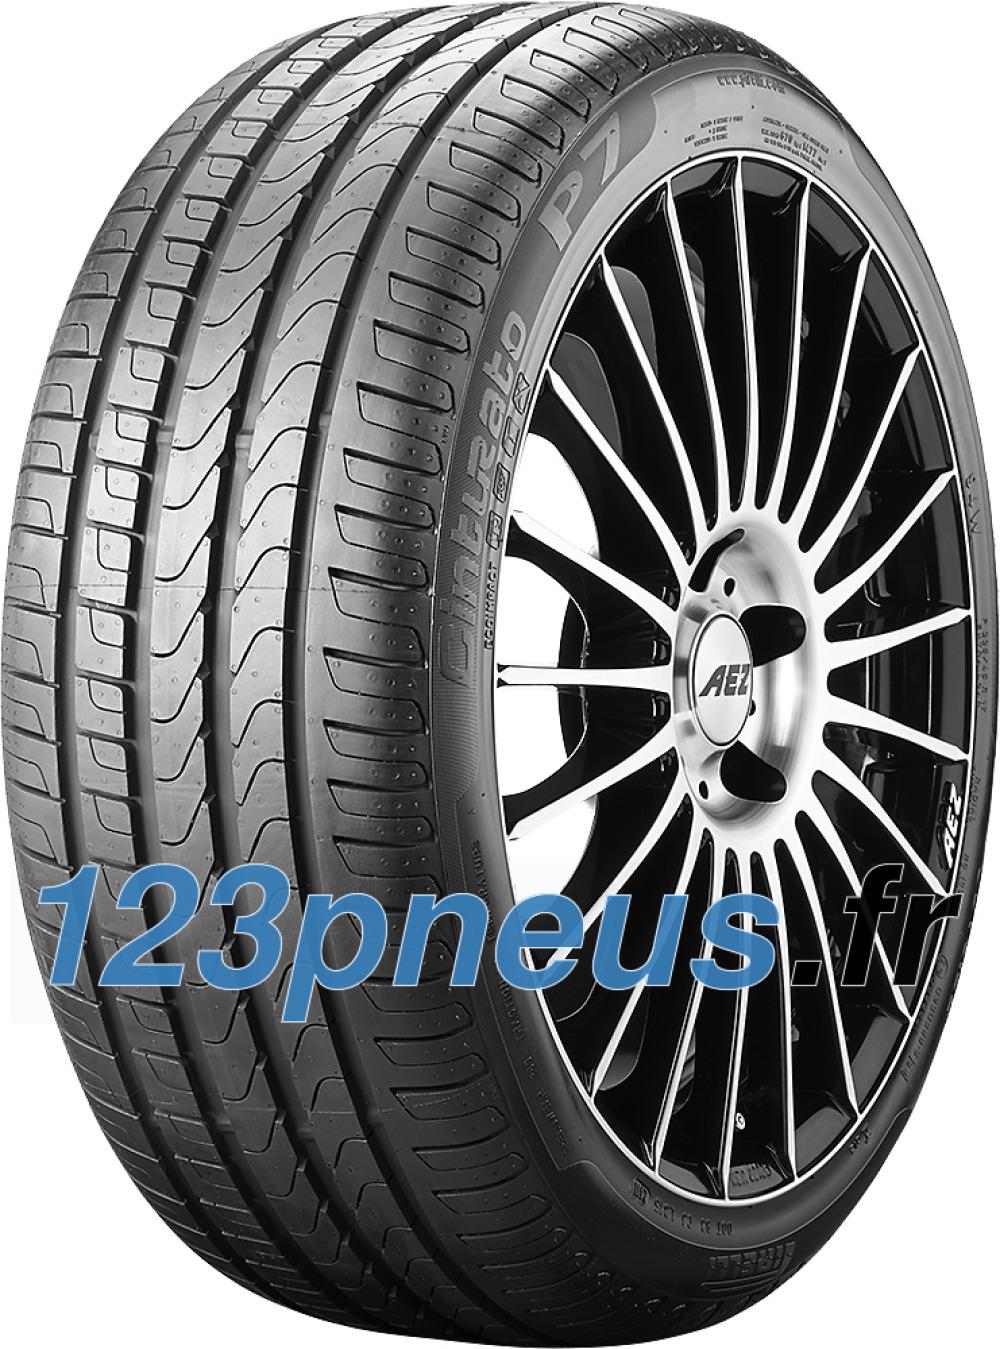 Pirelli Cinturato P7 ( 225/45 R17 91V MO, ECOIMPACT, avec protège-jante (MFS) )